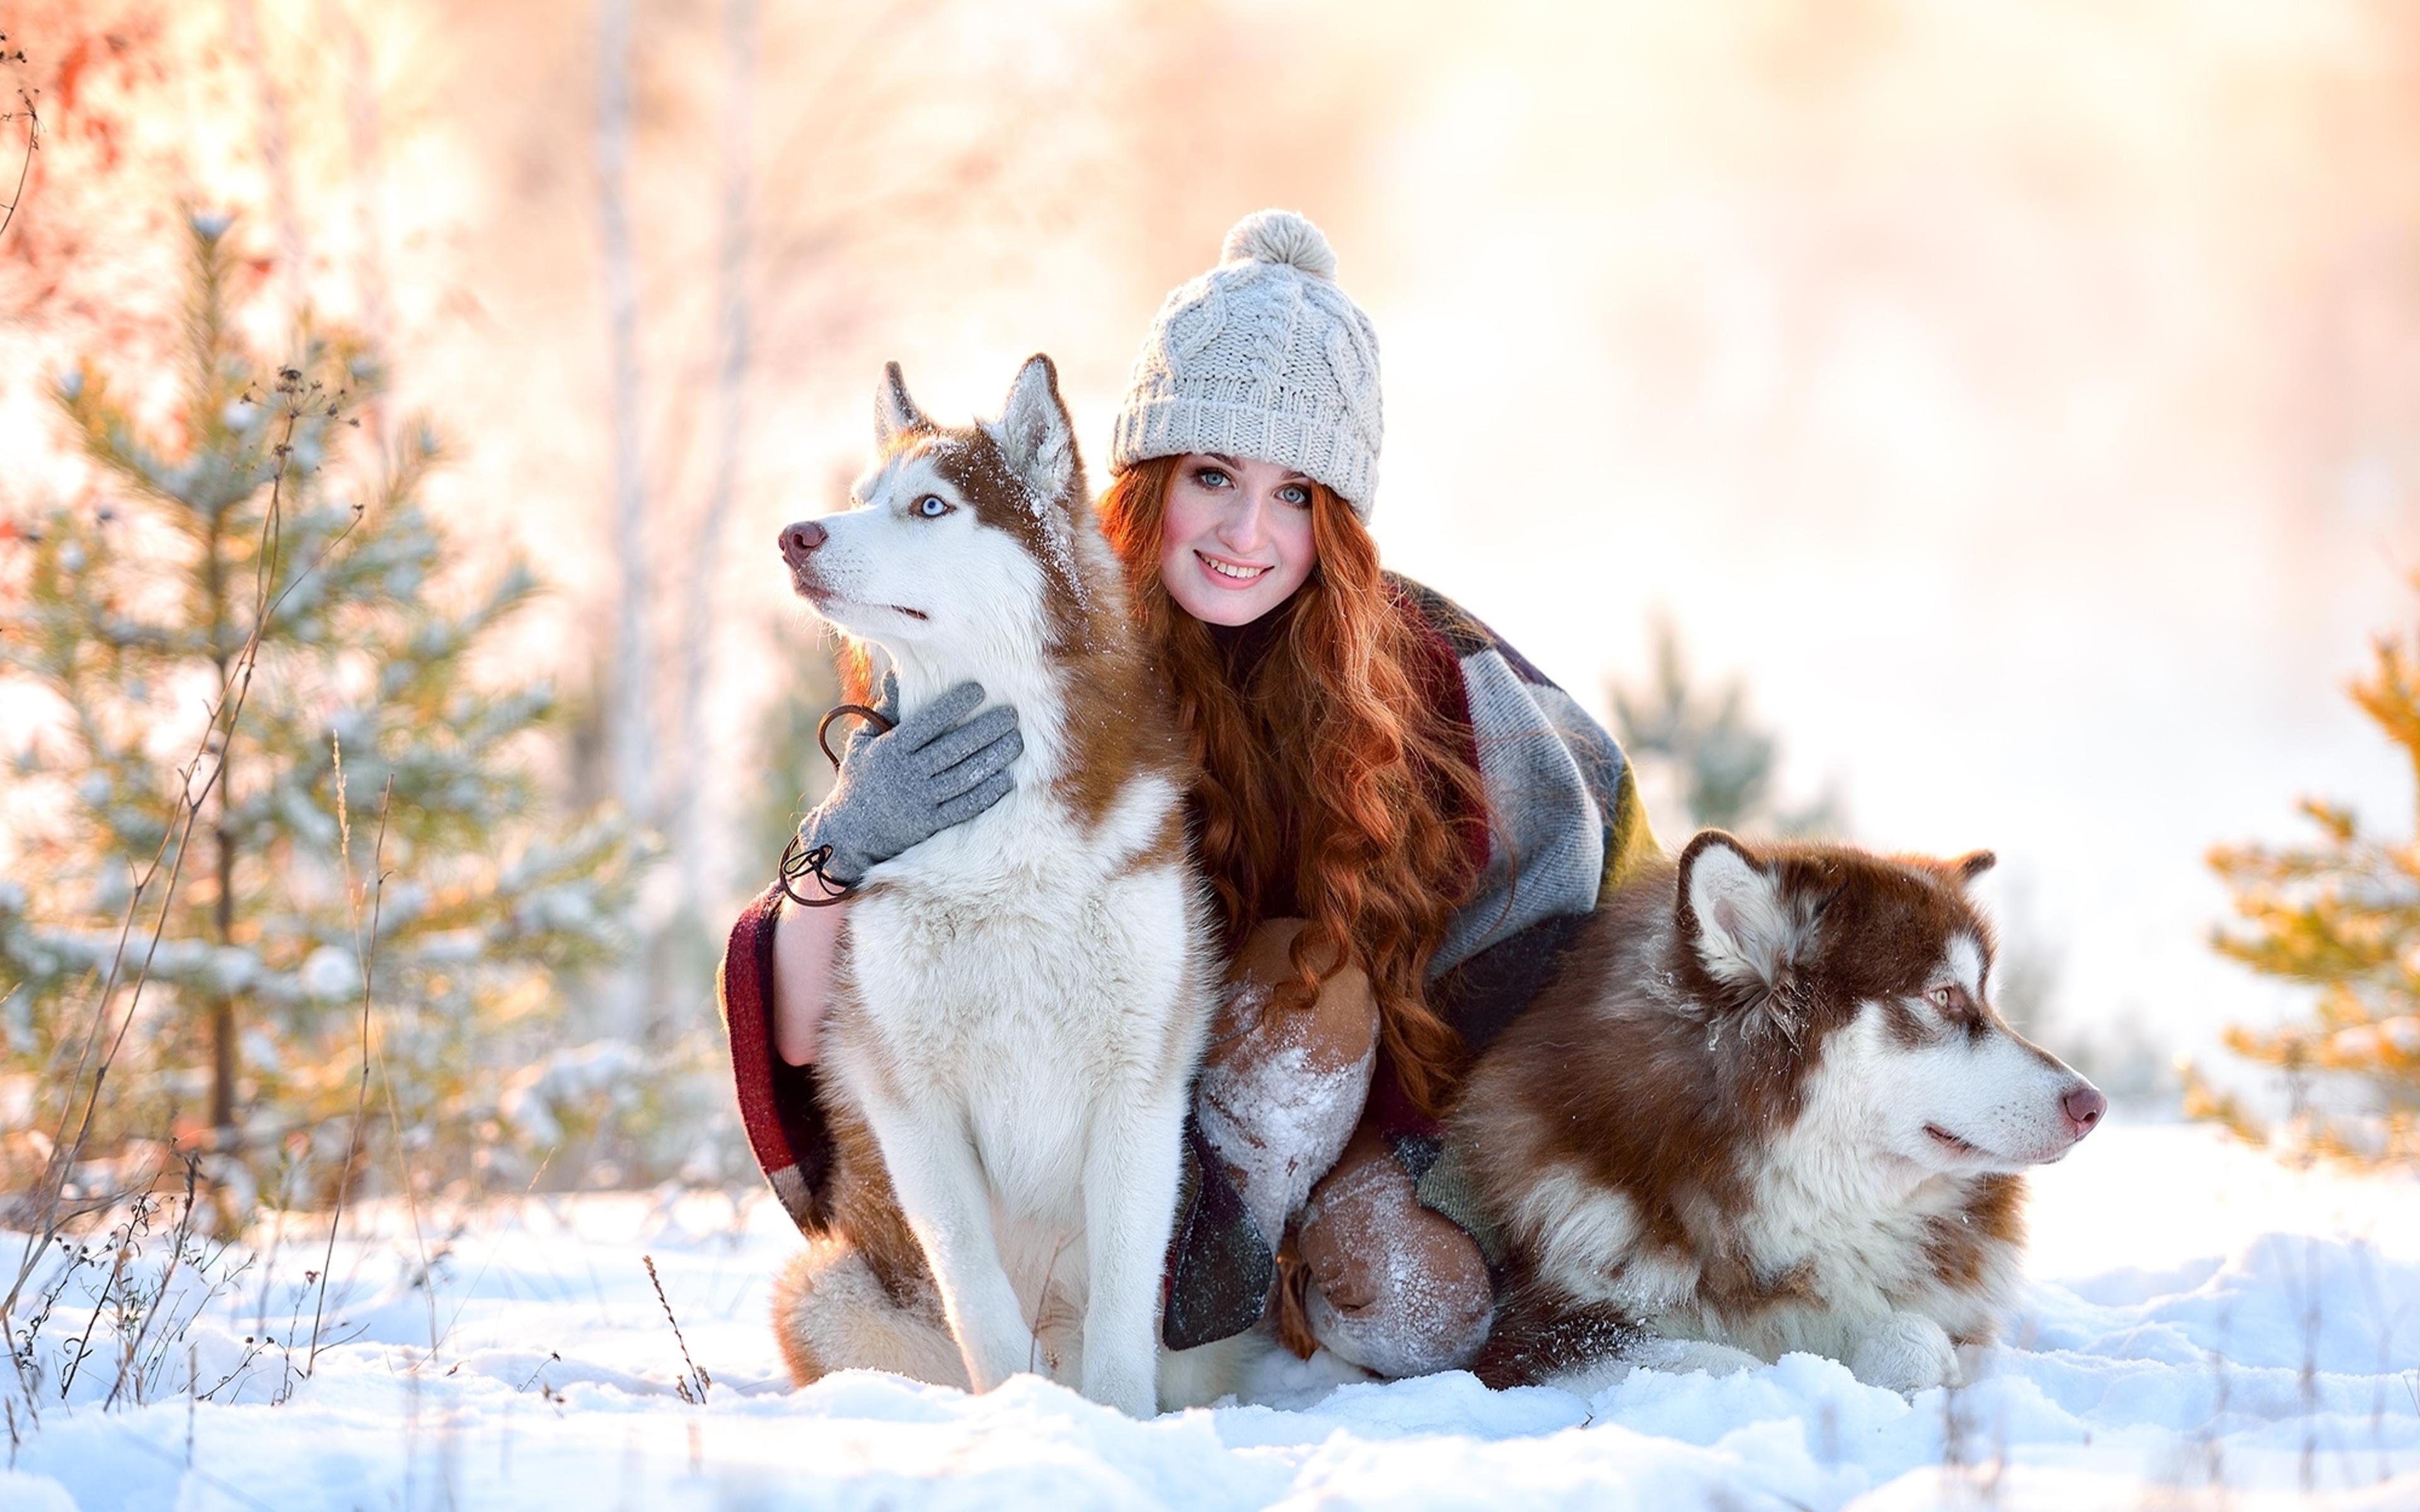 girl-in-snow-with-siberian-husky-image.jpg